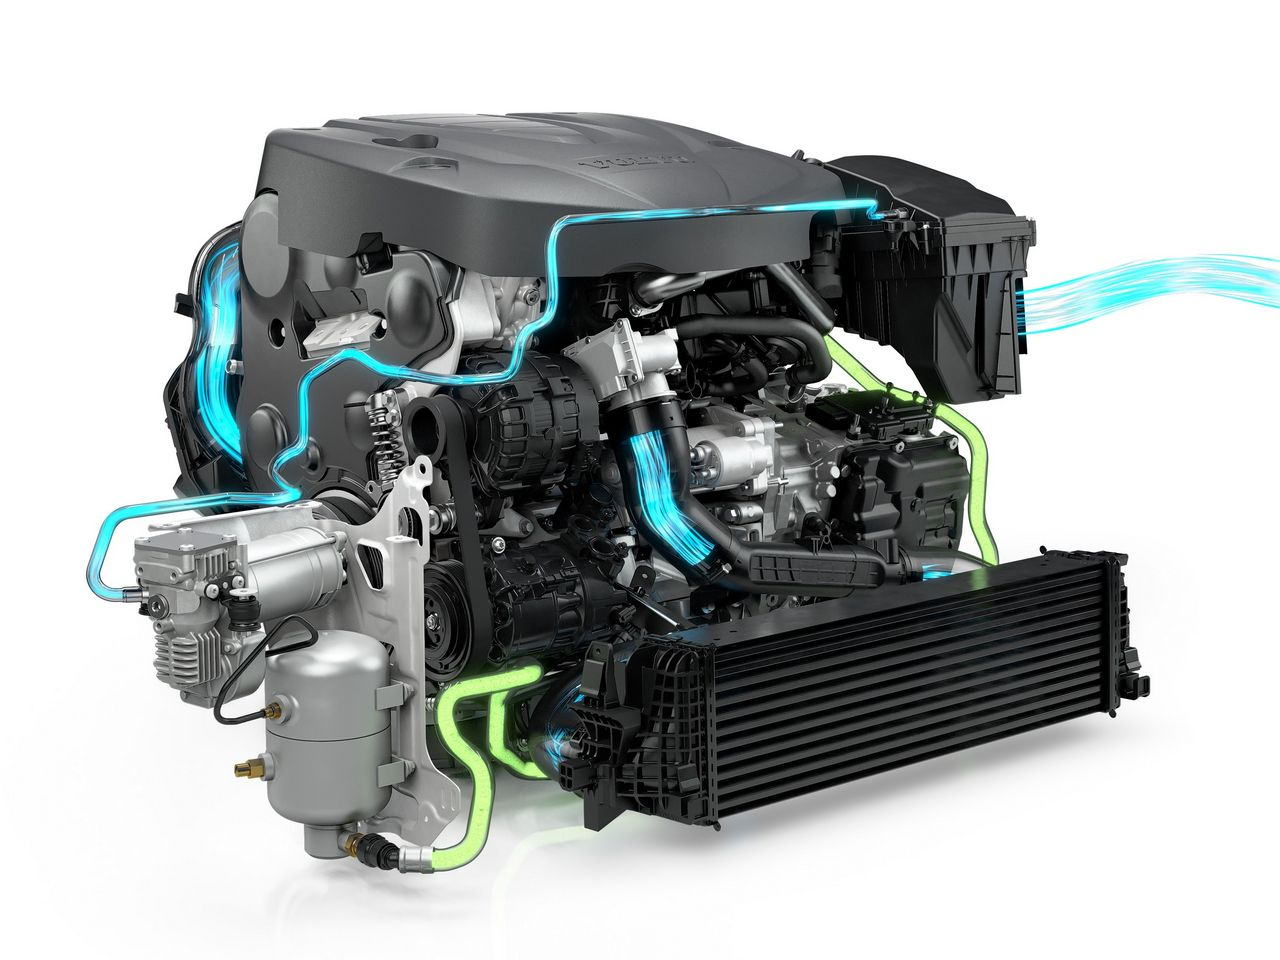 PowerPulse air from filter